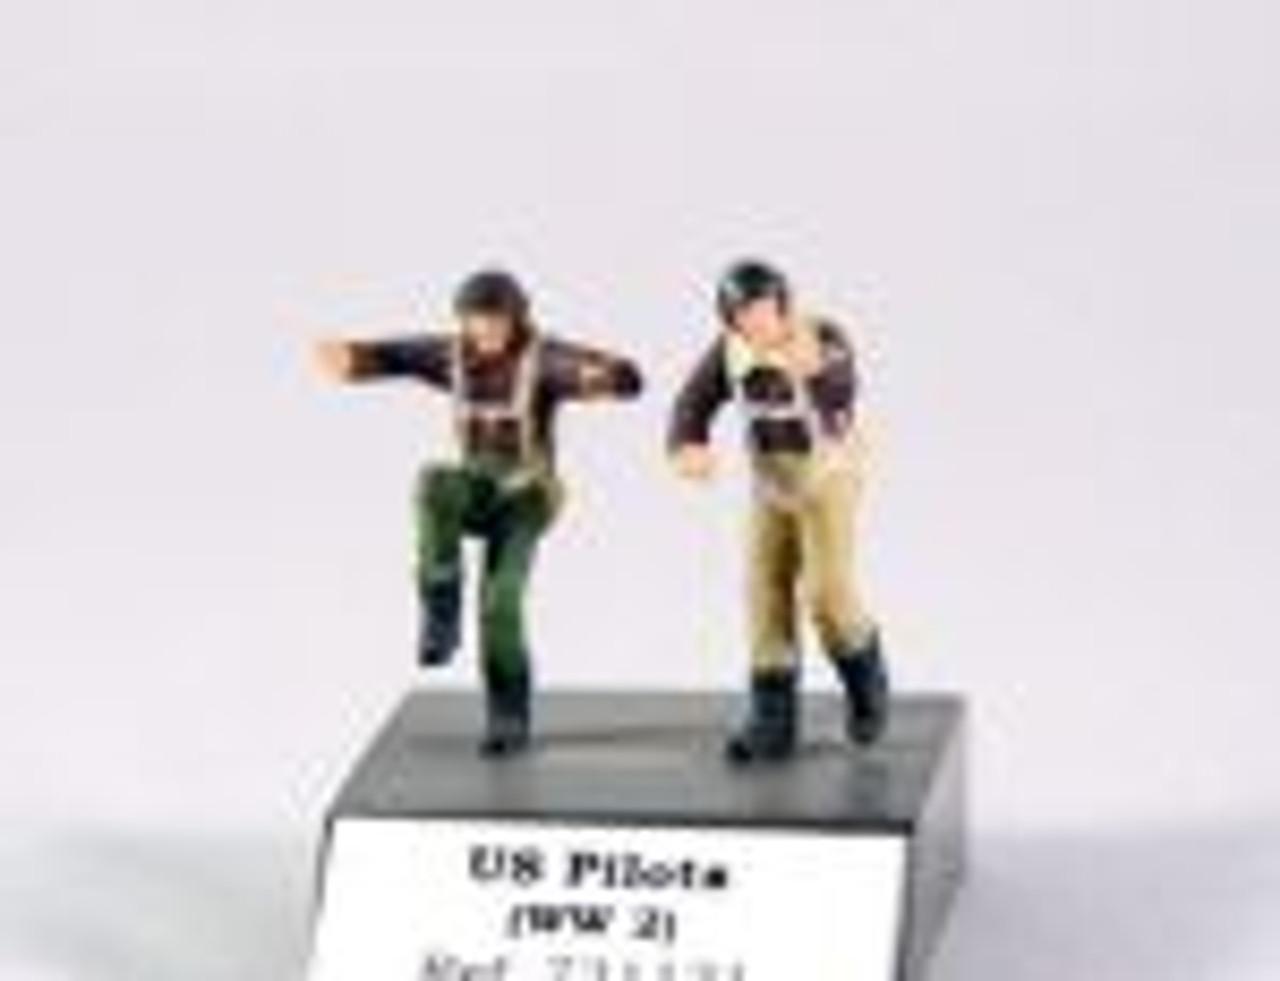 PJ Productions 2x USAF pilots standing WW2 Figures 1:72